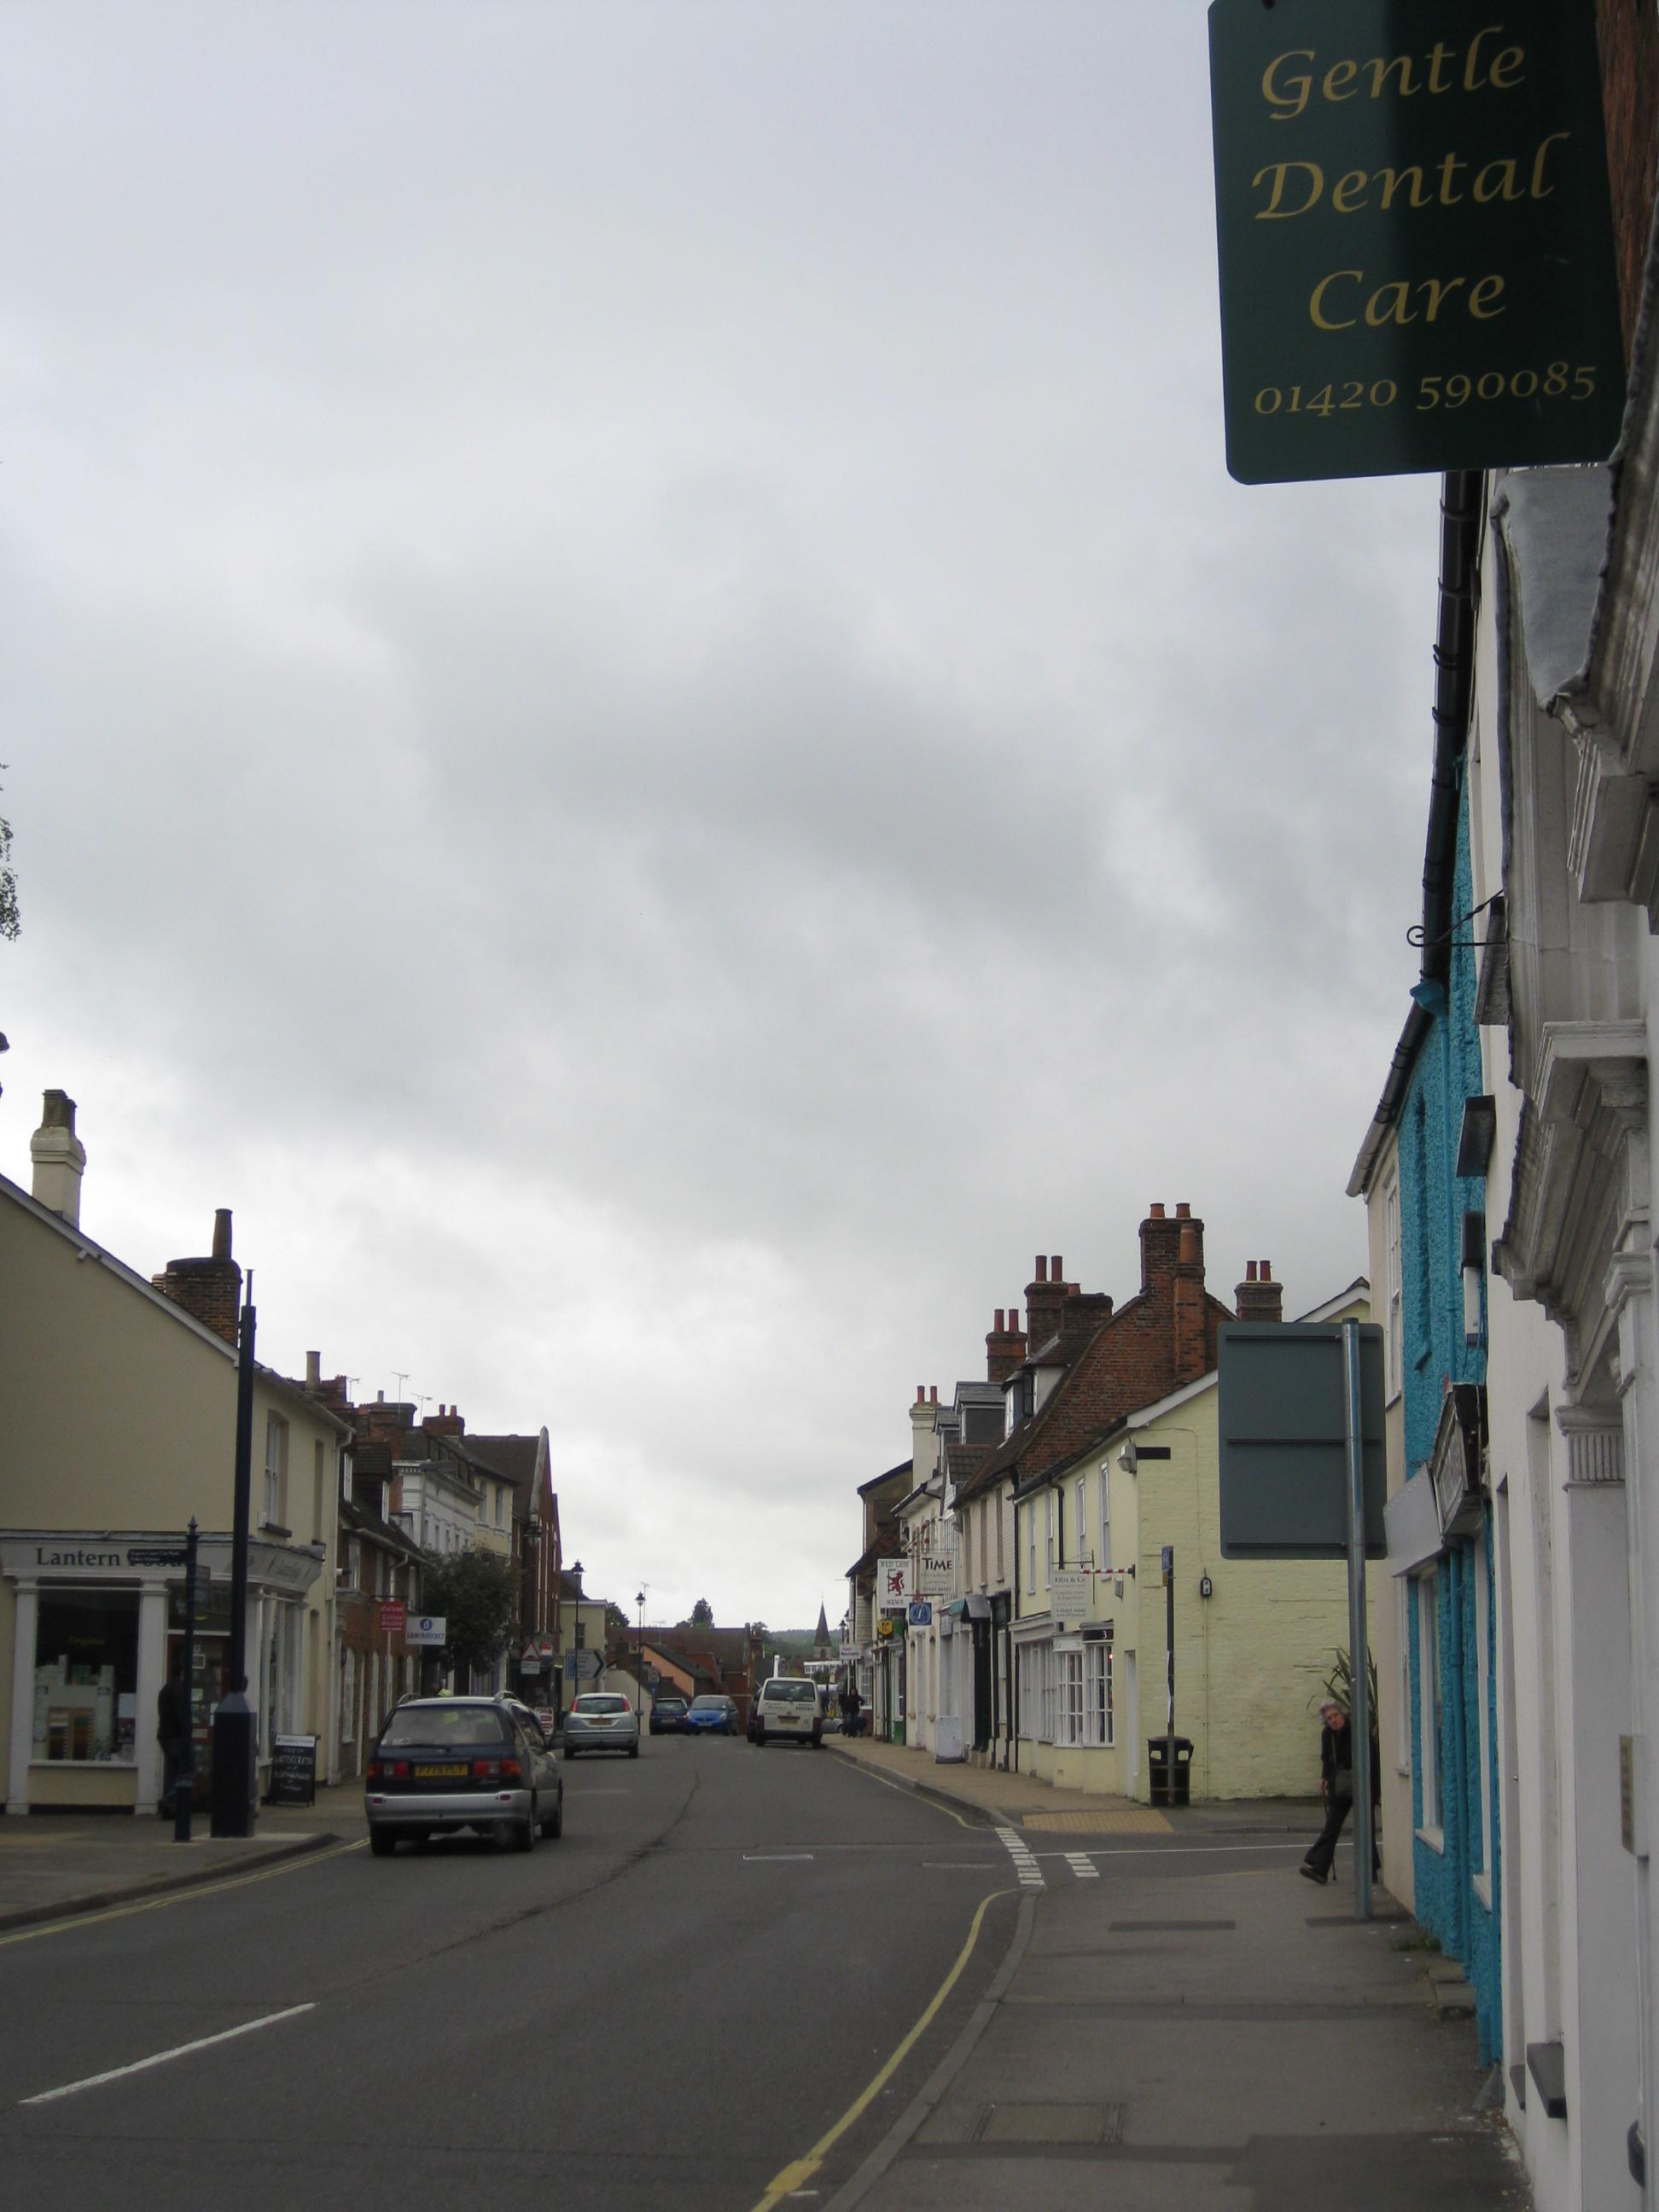 Alton High Street